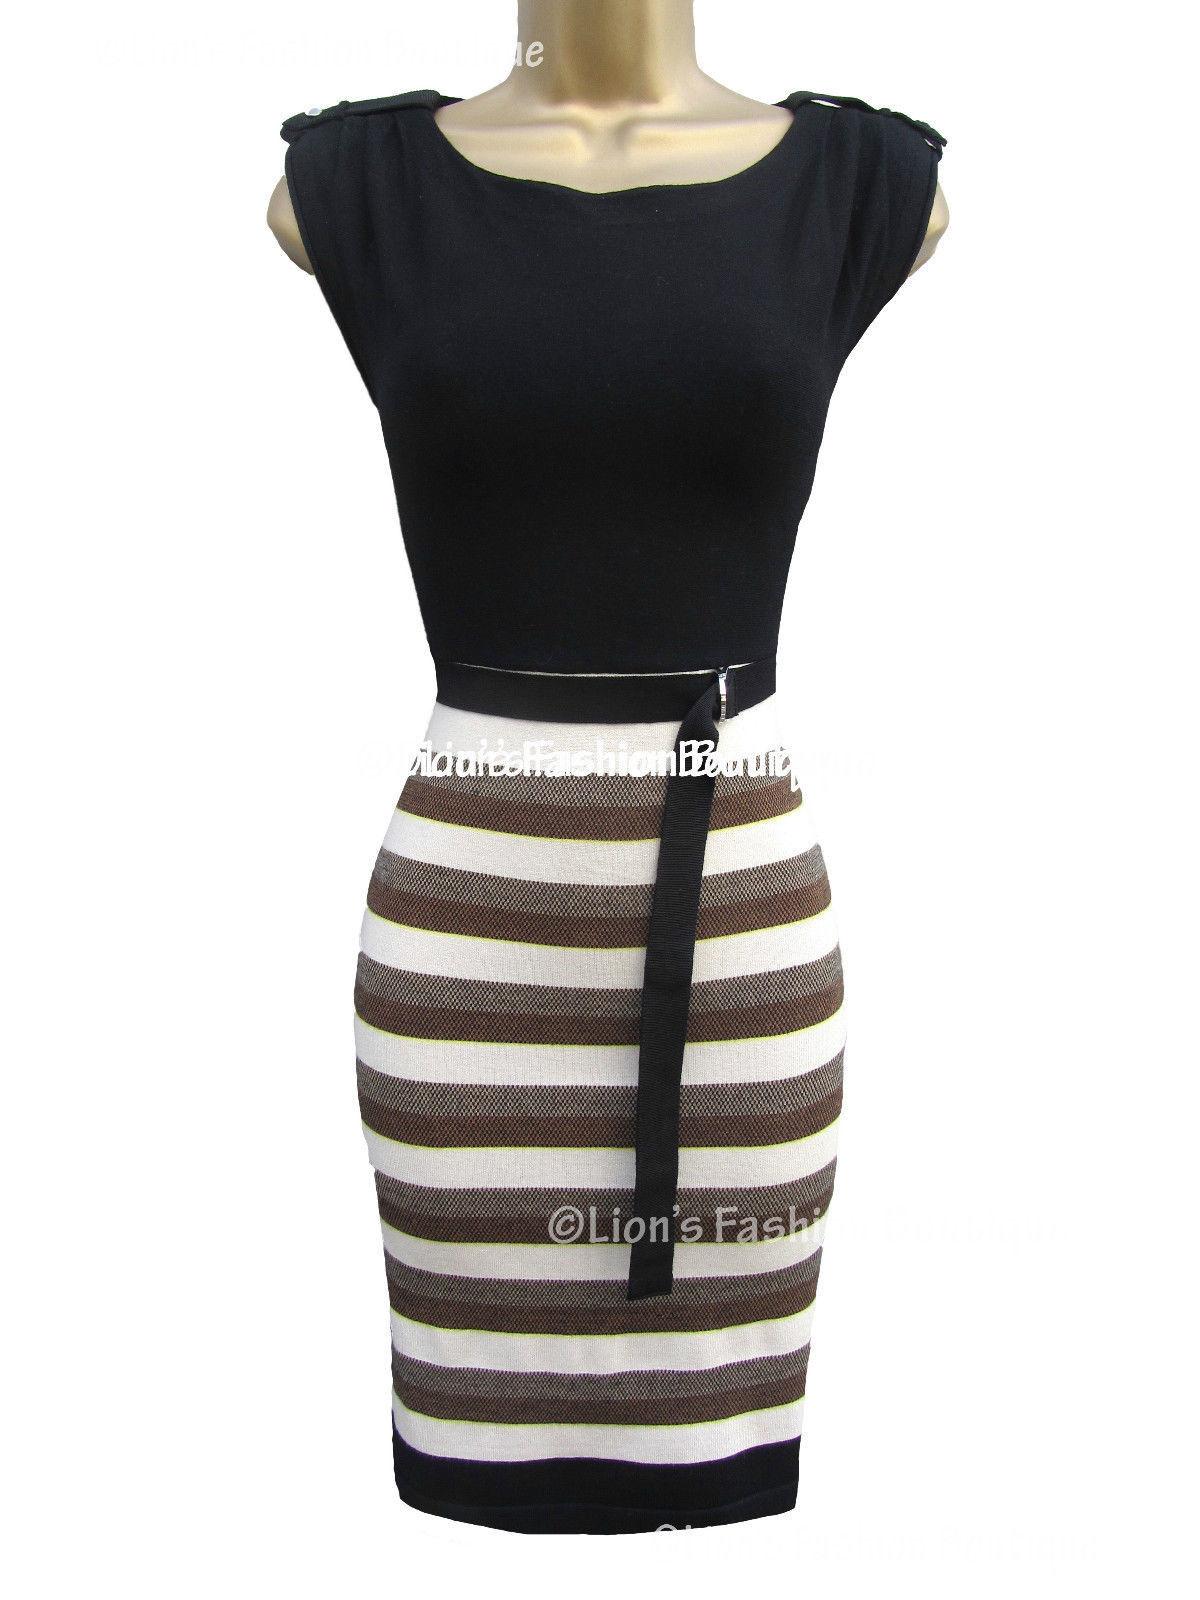 New KAREN MILLEN BNWT  Stripe Knit Evening Party Bodycon Bandage Dress SALE